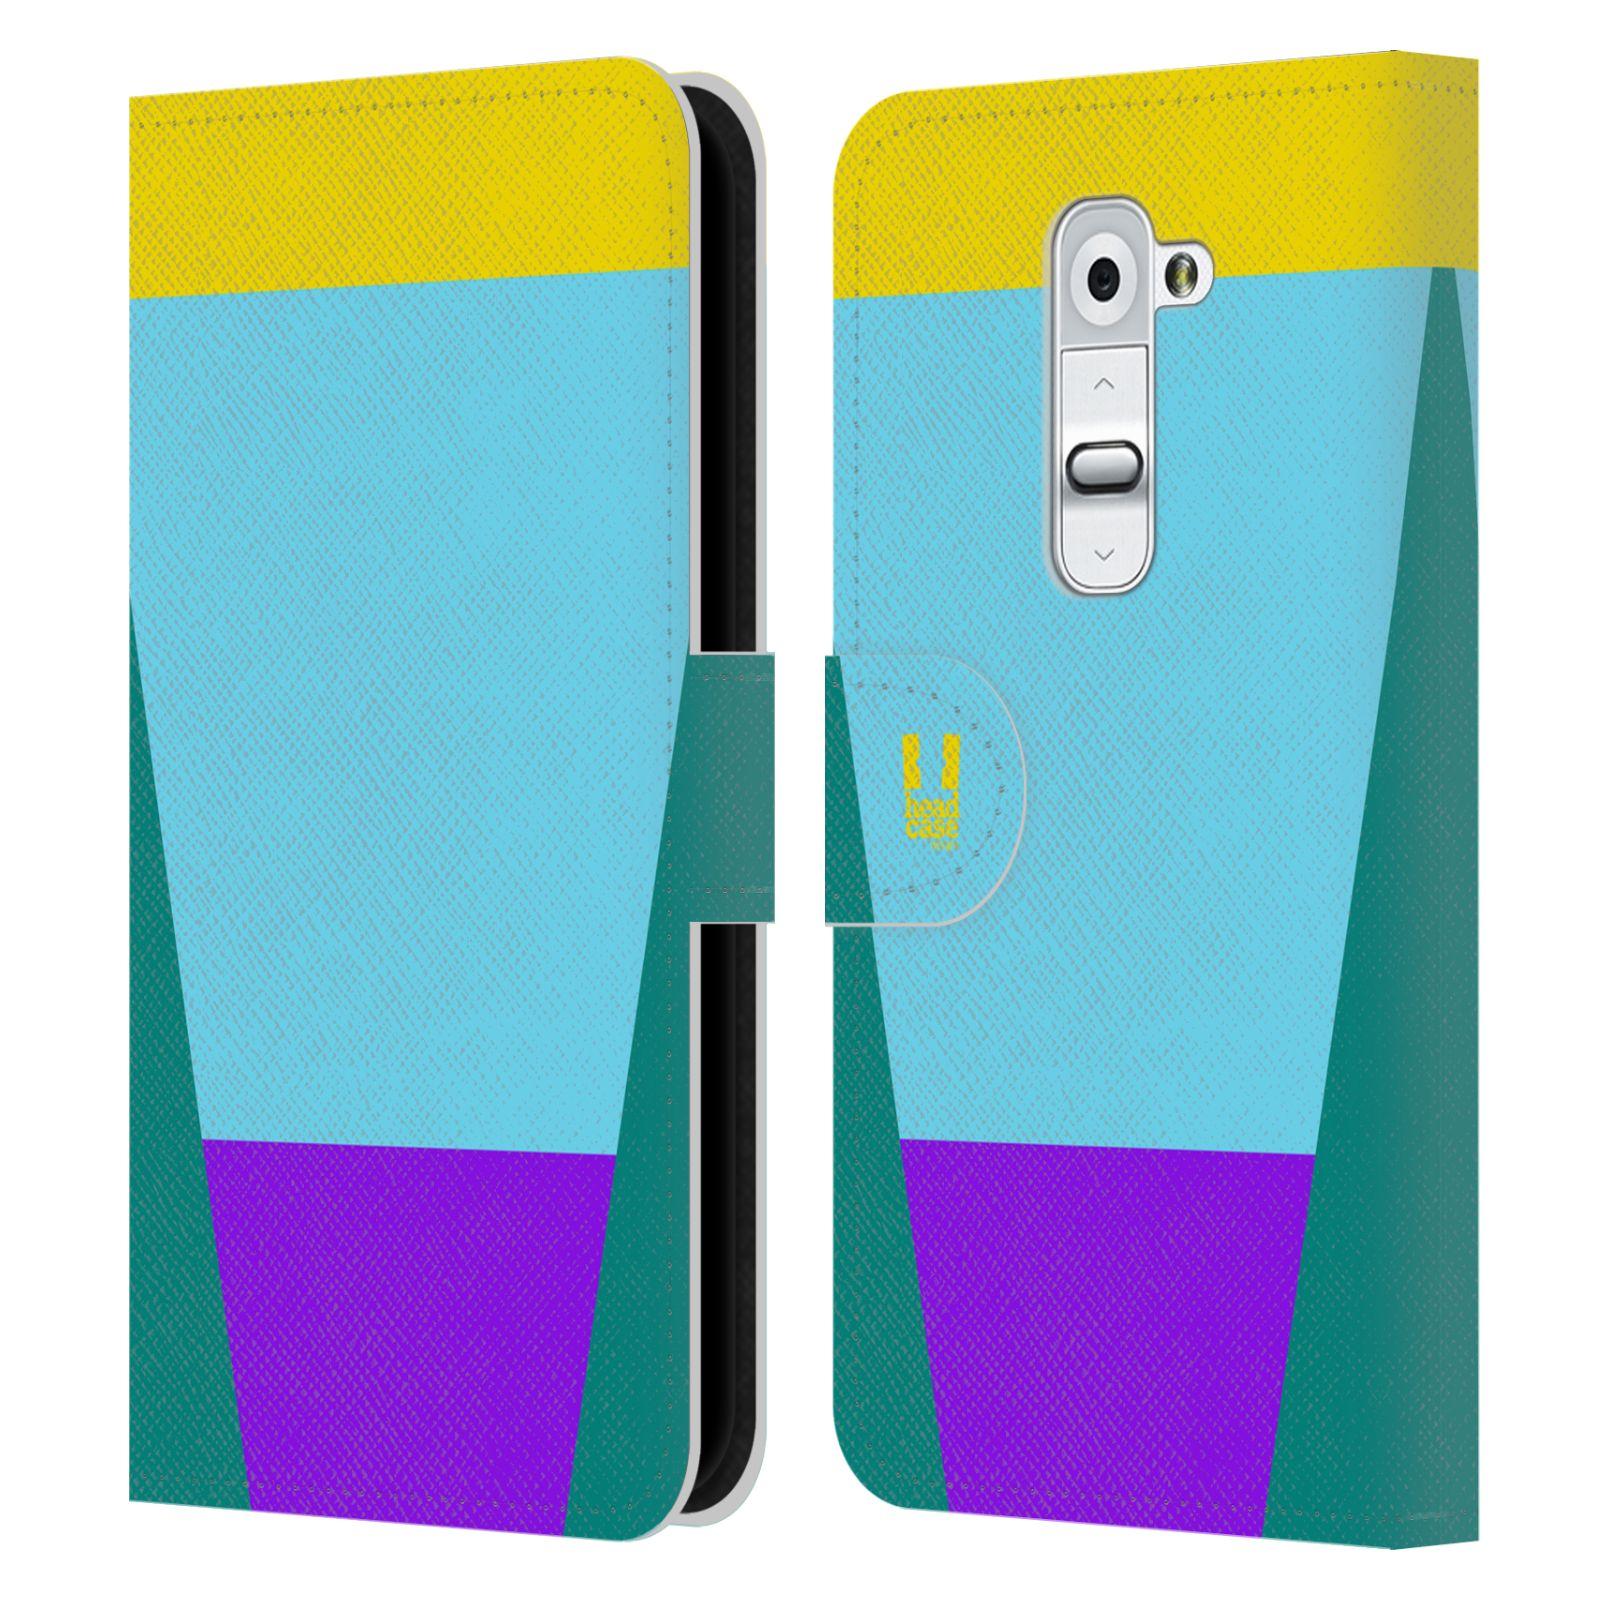 HEAD CASE Flipové pouzdro pro mobil LG G2 barevné tvary nebesky modrá